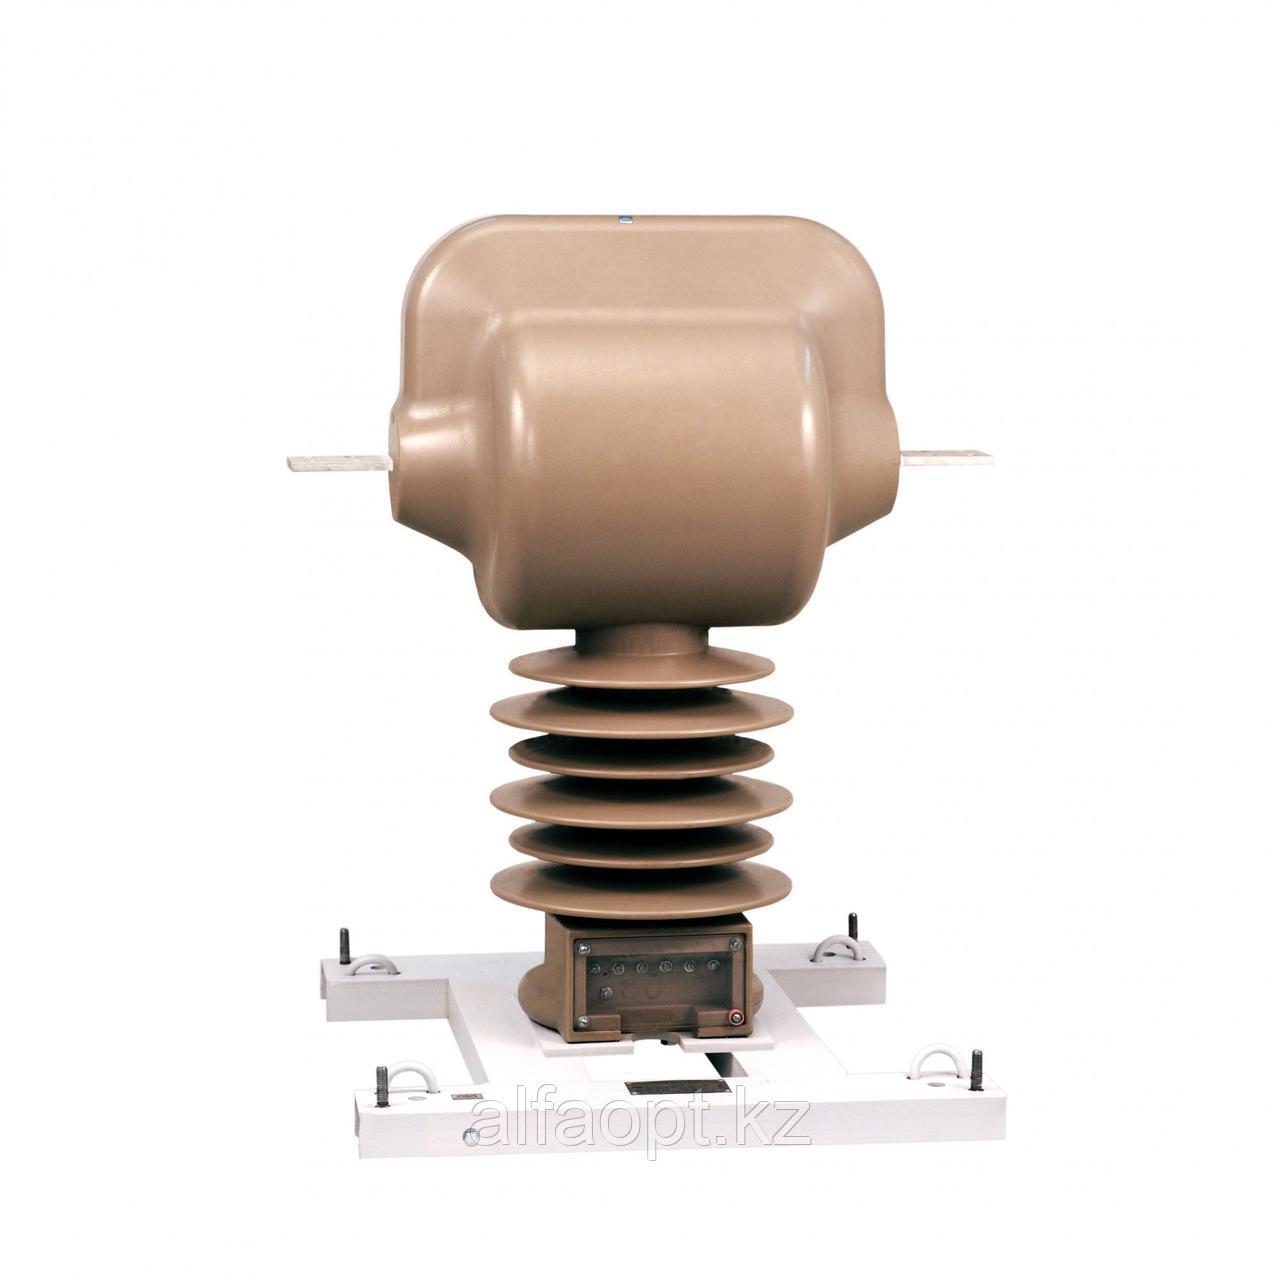 Трансформатор тока ТОЛ-35 III-V